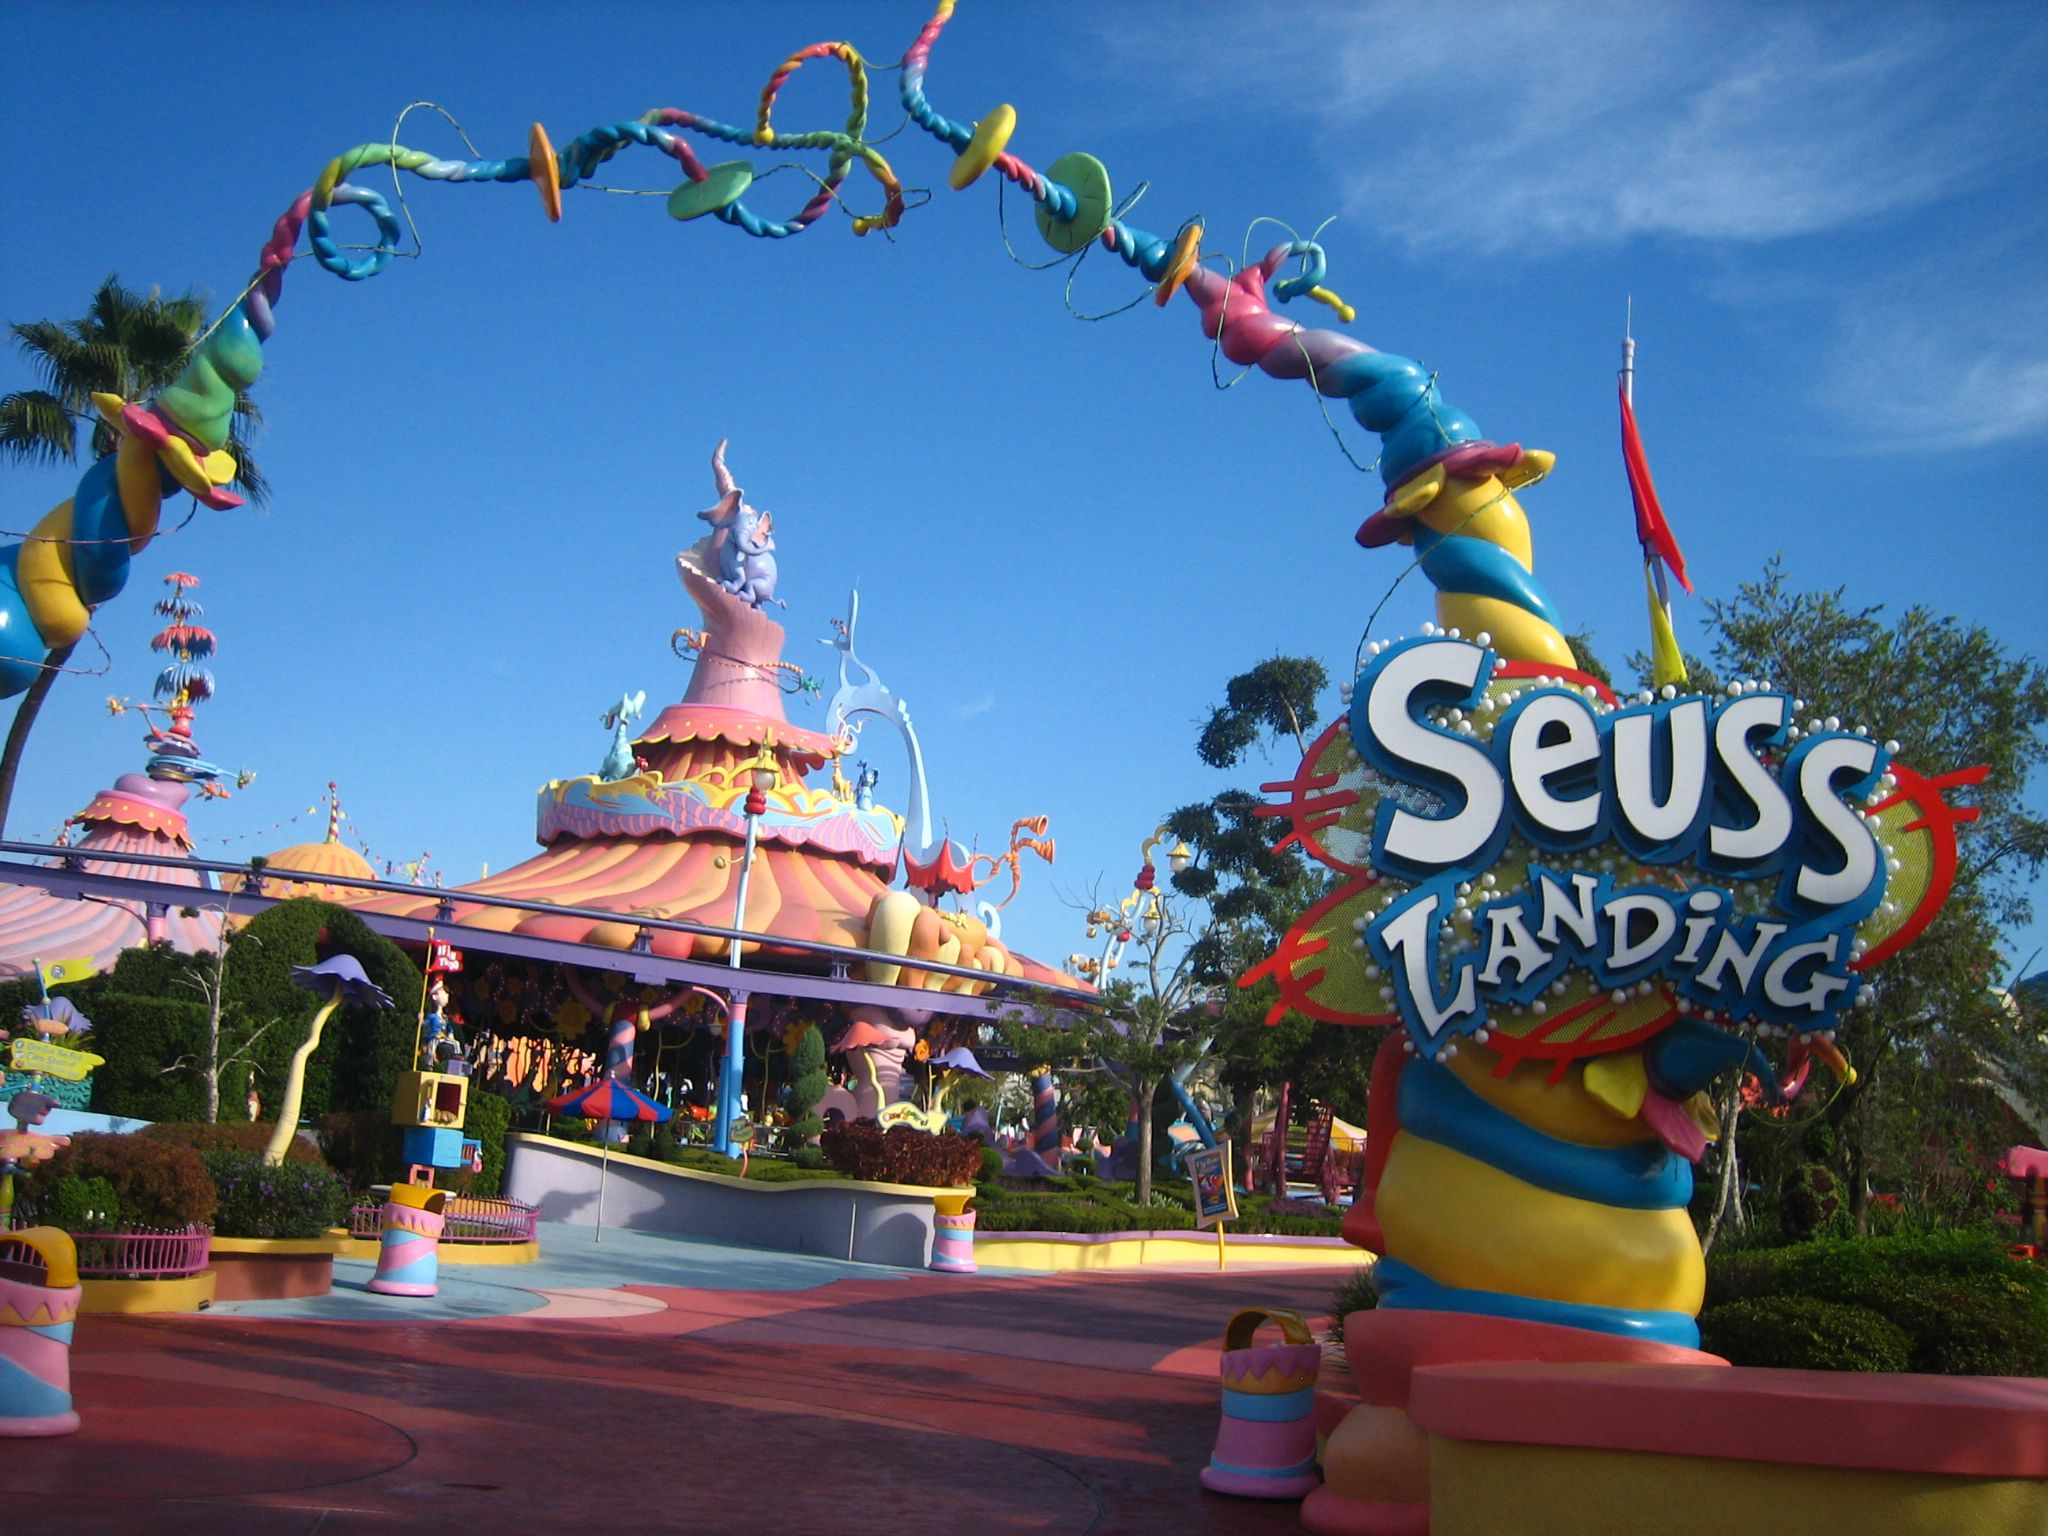 Seuss Landing Fun For Little Kids At Universal Orlando